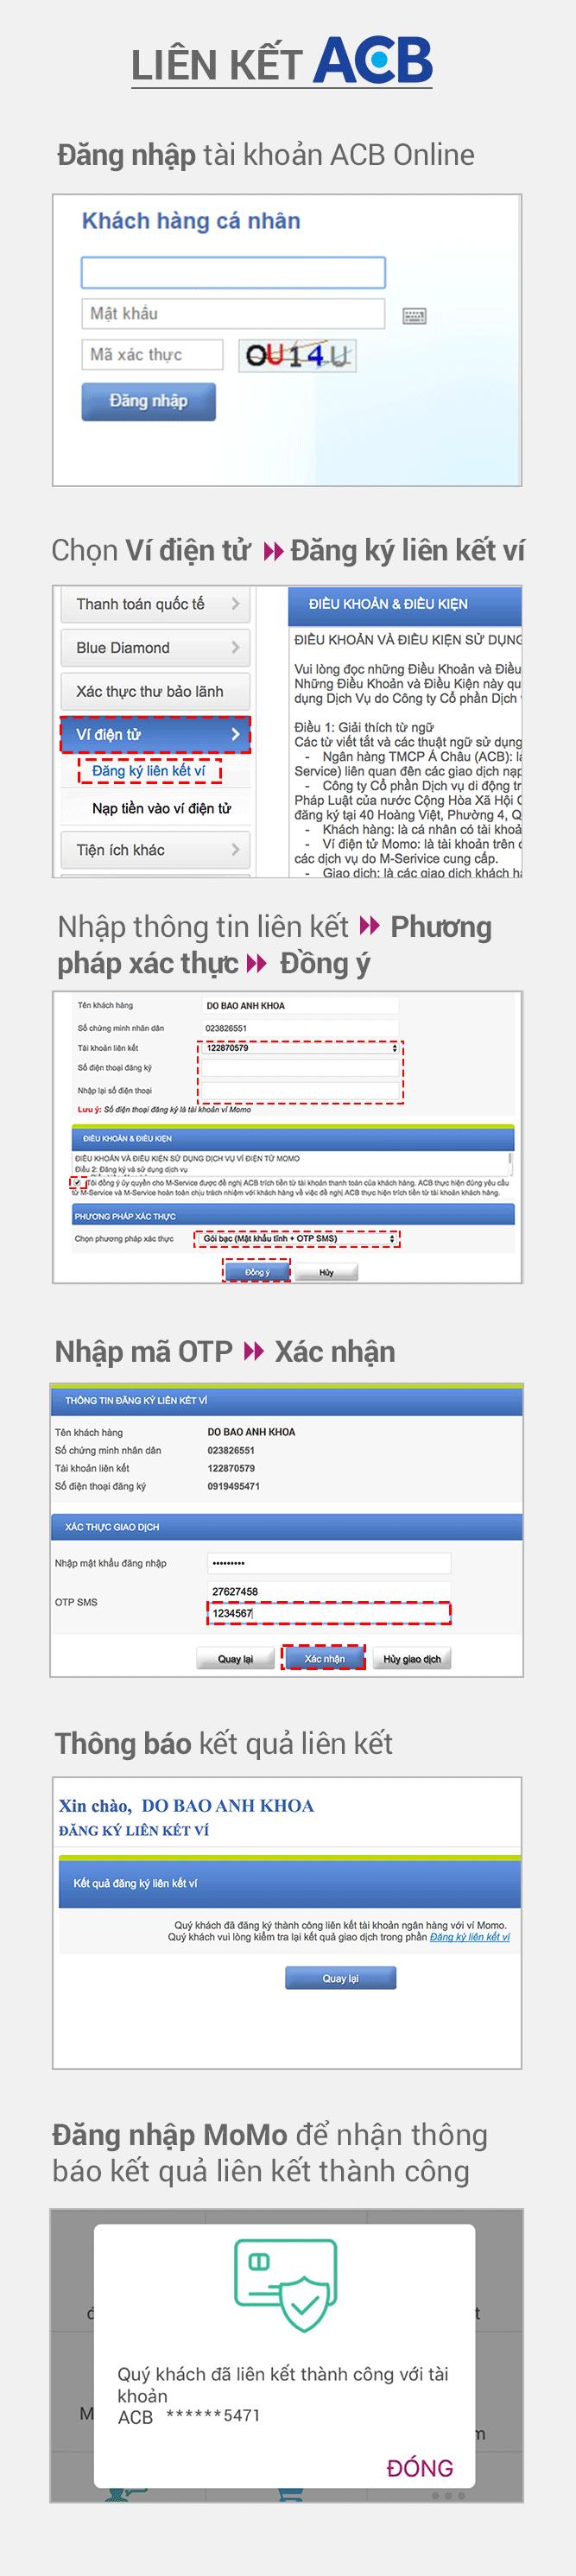 Gim 100000 Khi Thanh Ton Bng Momo Samsung Ua65ks9000kpxd Led Tv 65 Inch Hng Dn Lin Kt Acb Bank